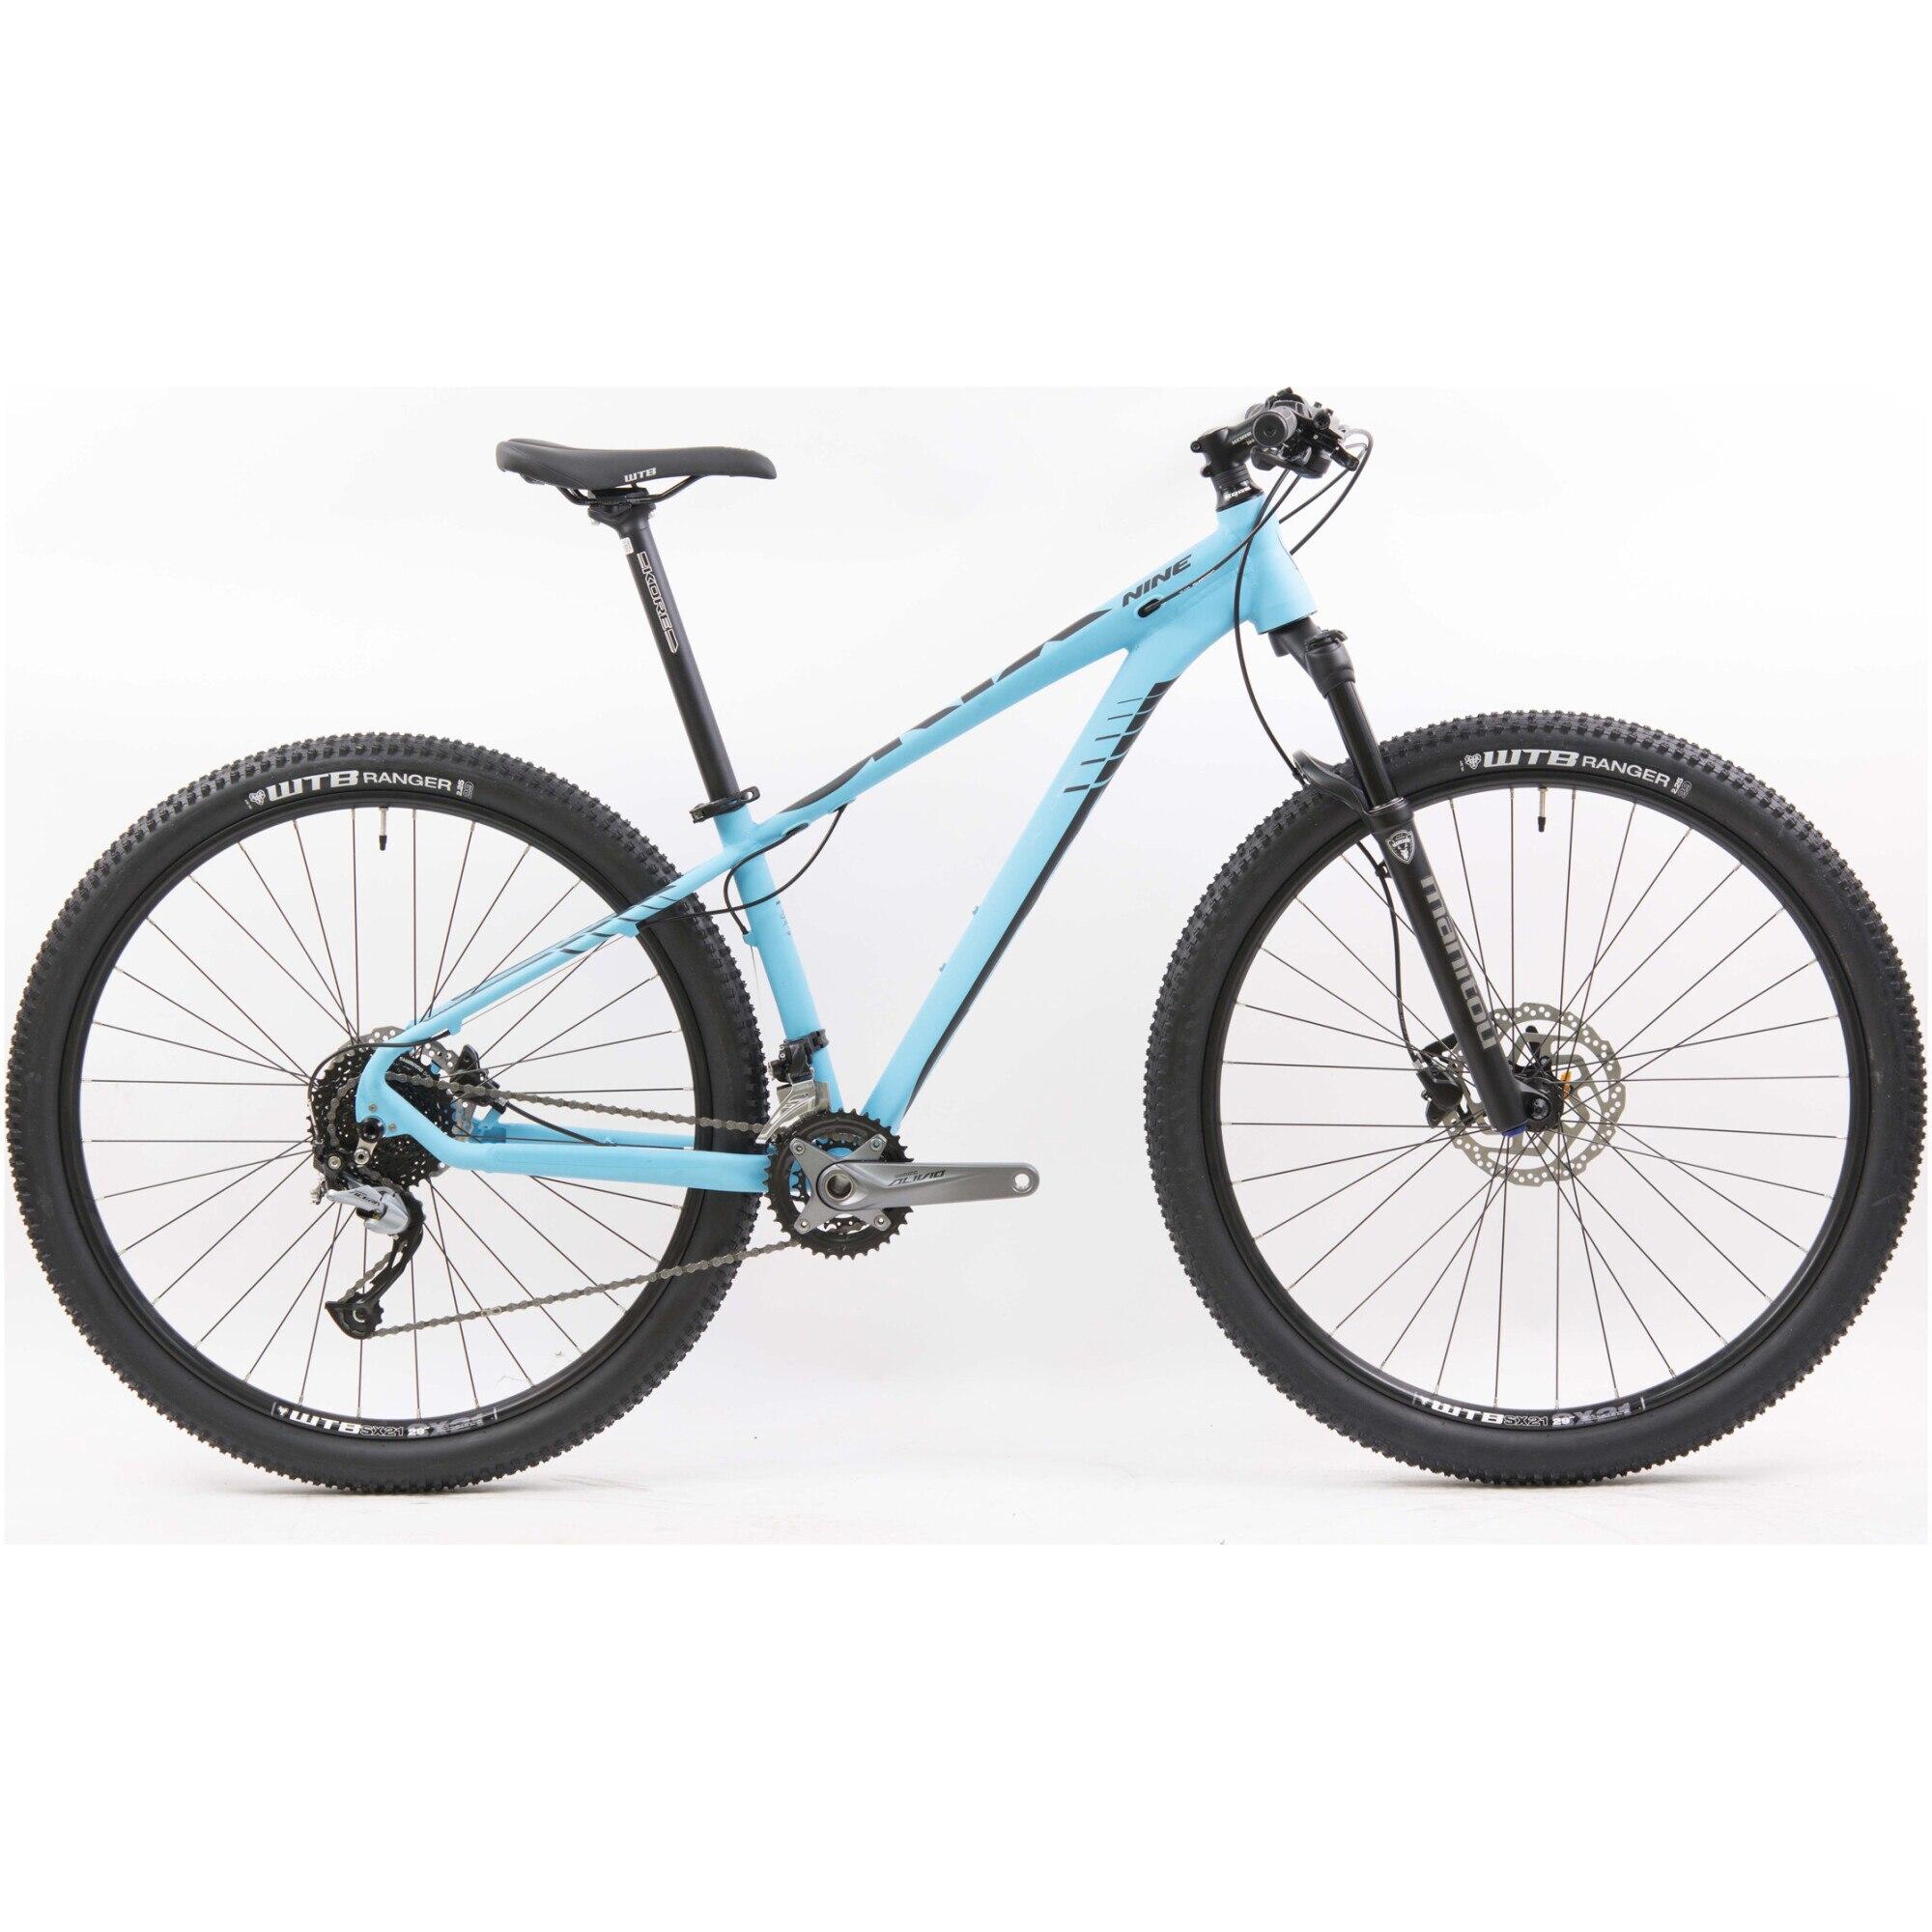 Fotografie Bicicleta MTB 29-er Leader Oryx 3.0 E38 Shimano M3100 3x9, Furca Manitou Markho, S, Turquase/Black Matt